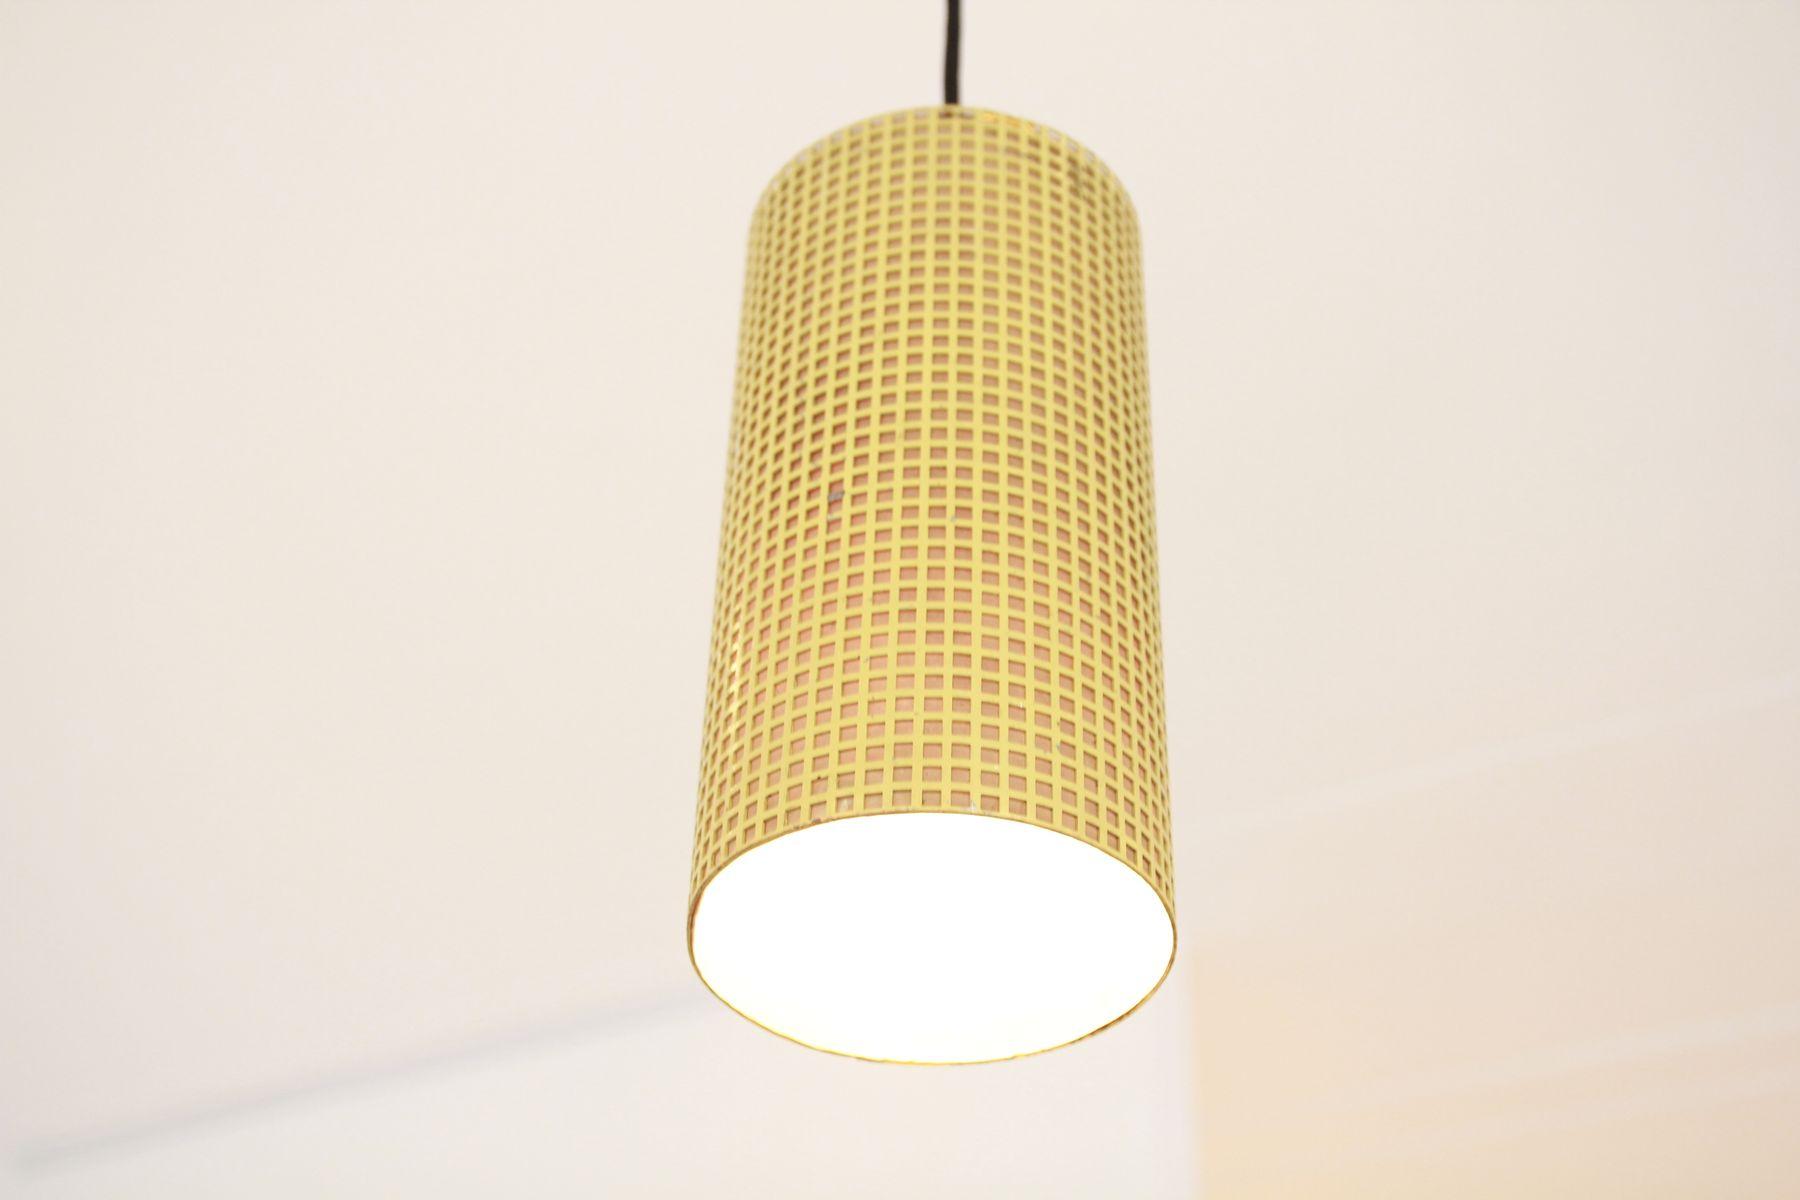 Vintage Yellow Perforated Metal Pendant Lamp 4 286 00 Price Per Piece